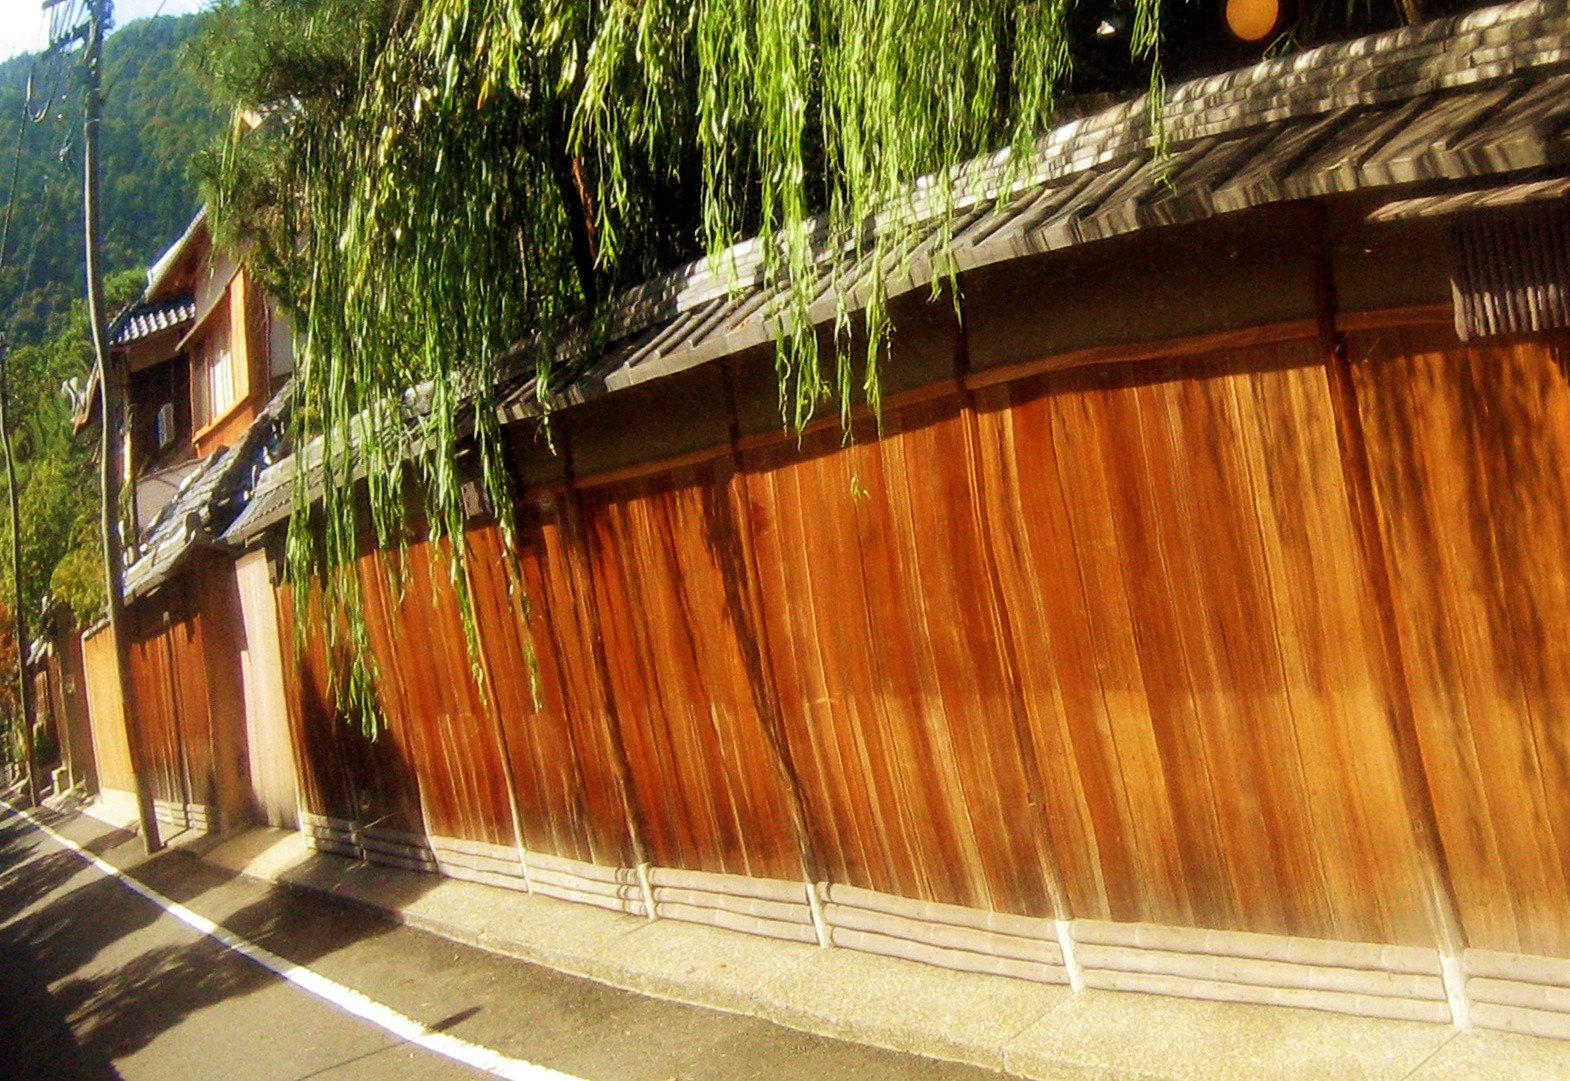 A side street off of Shirakawa-dori. . . in a mirror. Kyoto. 2007.